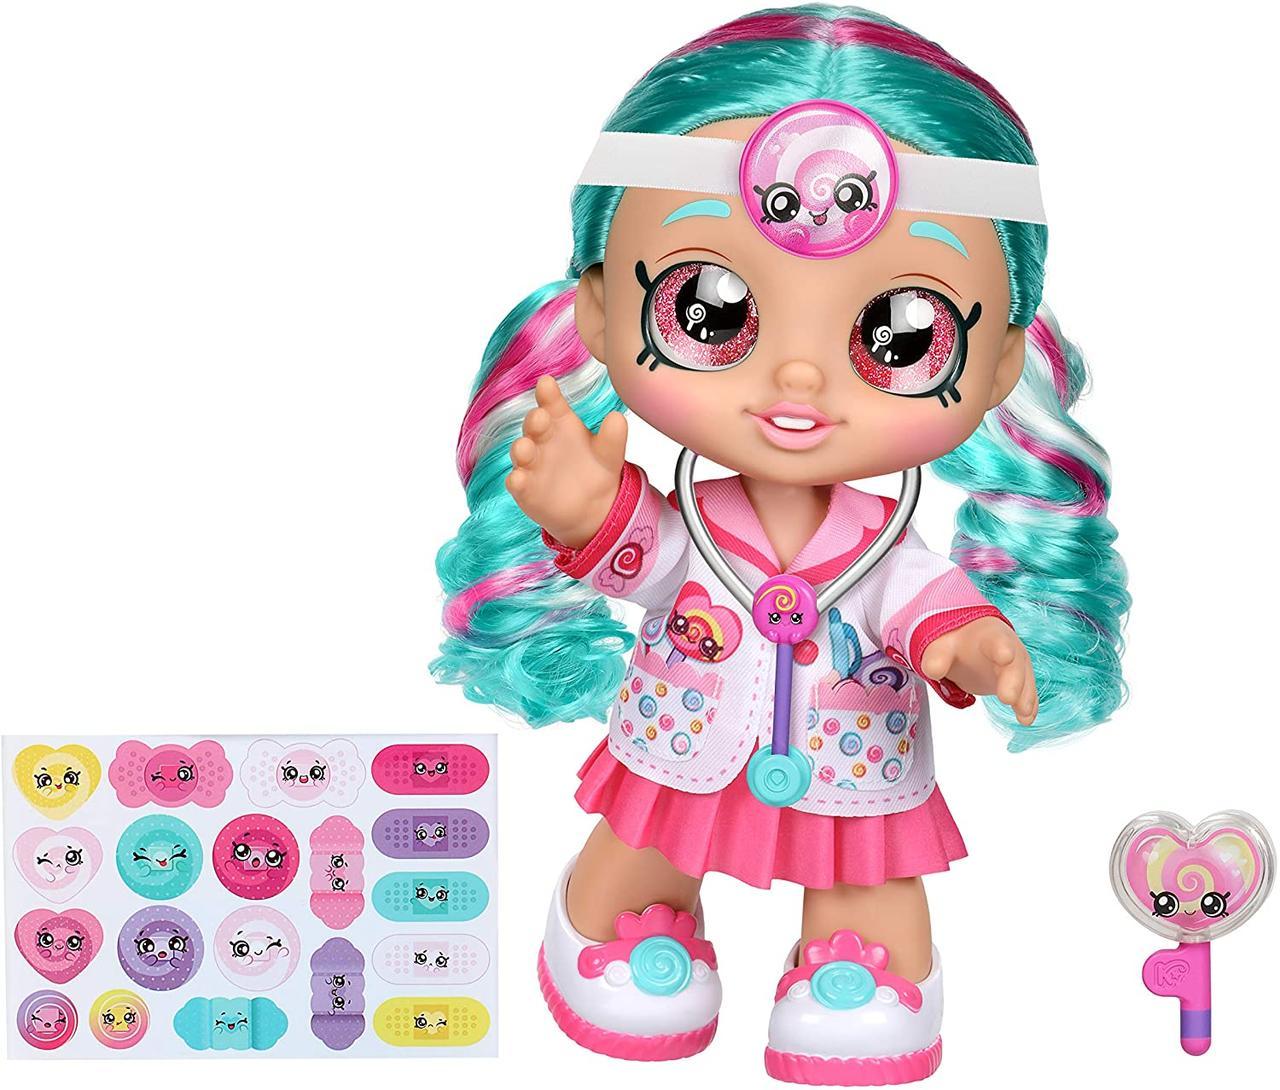 Kindi Kids Кукла Кинди Кидс доктор Синди Попс Kindi Kids Dr Cindy Pops Doll